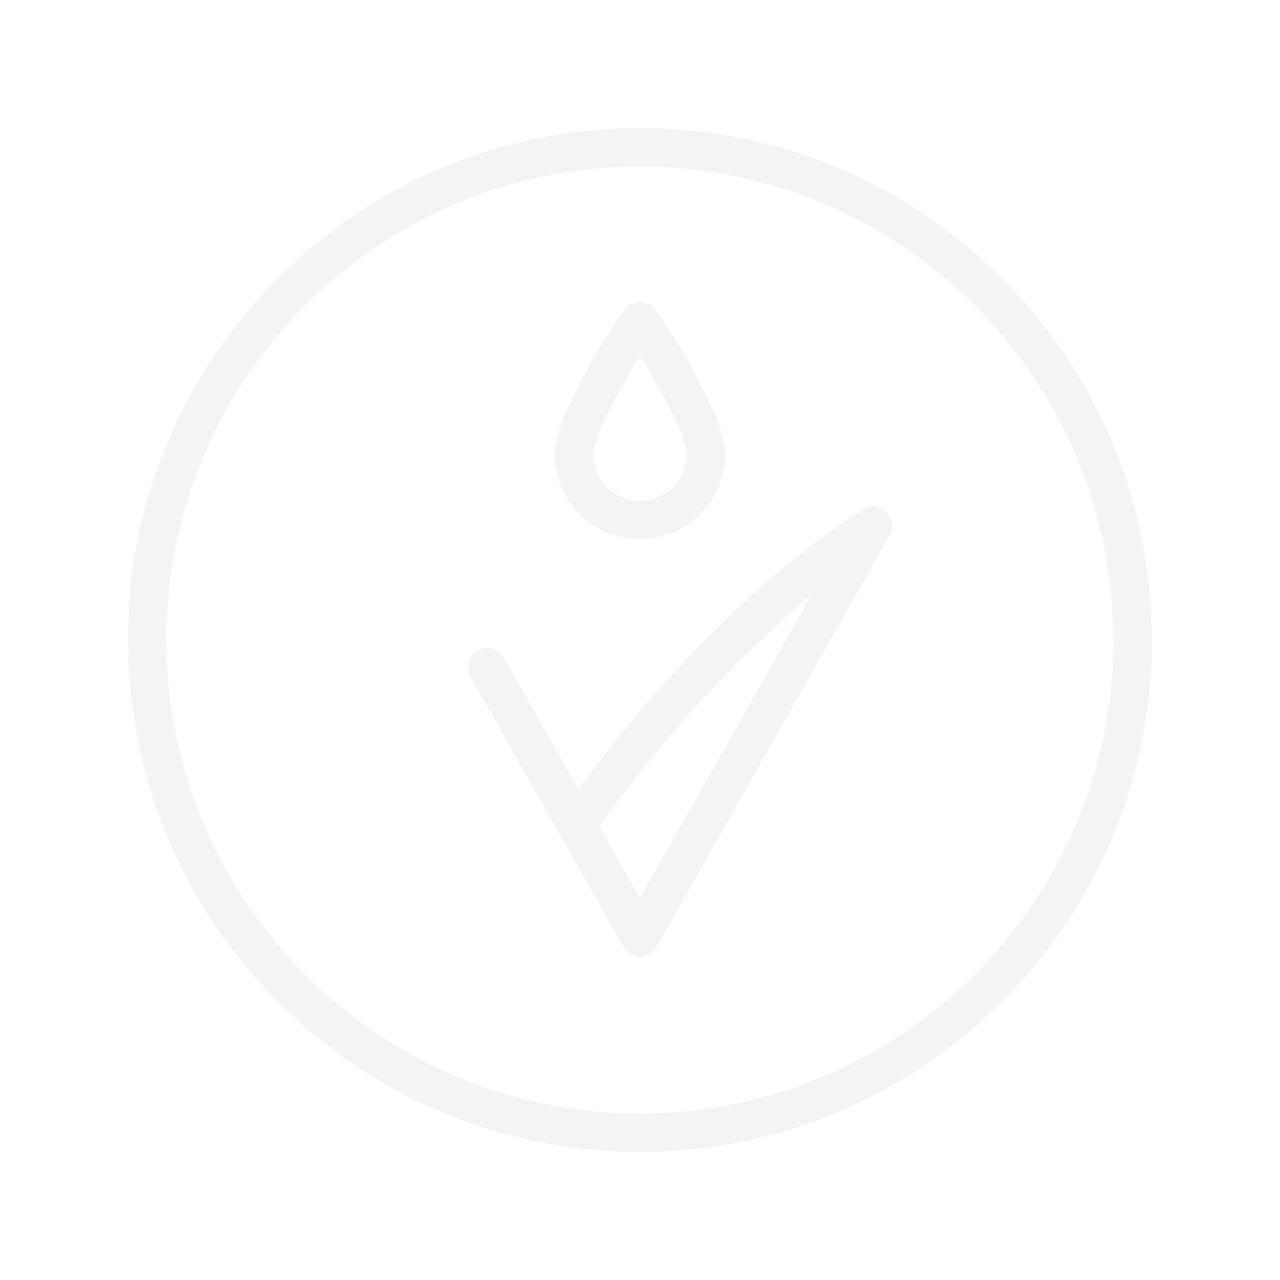 MAKEUP REVOLUTION I Love Makeup Chocolate Eyeshadow Mini Palette 10.2g